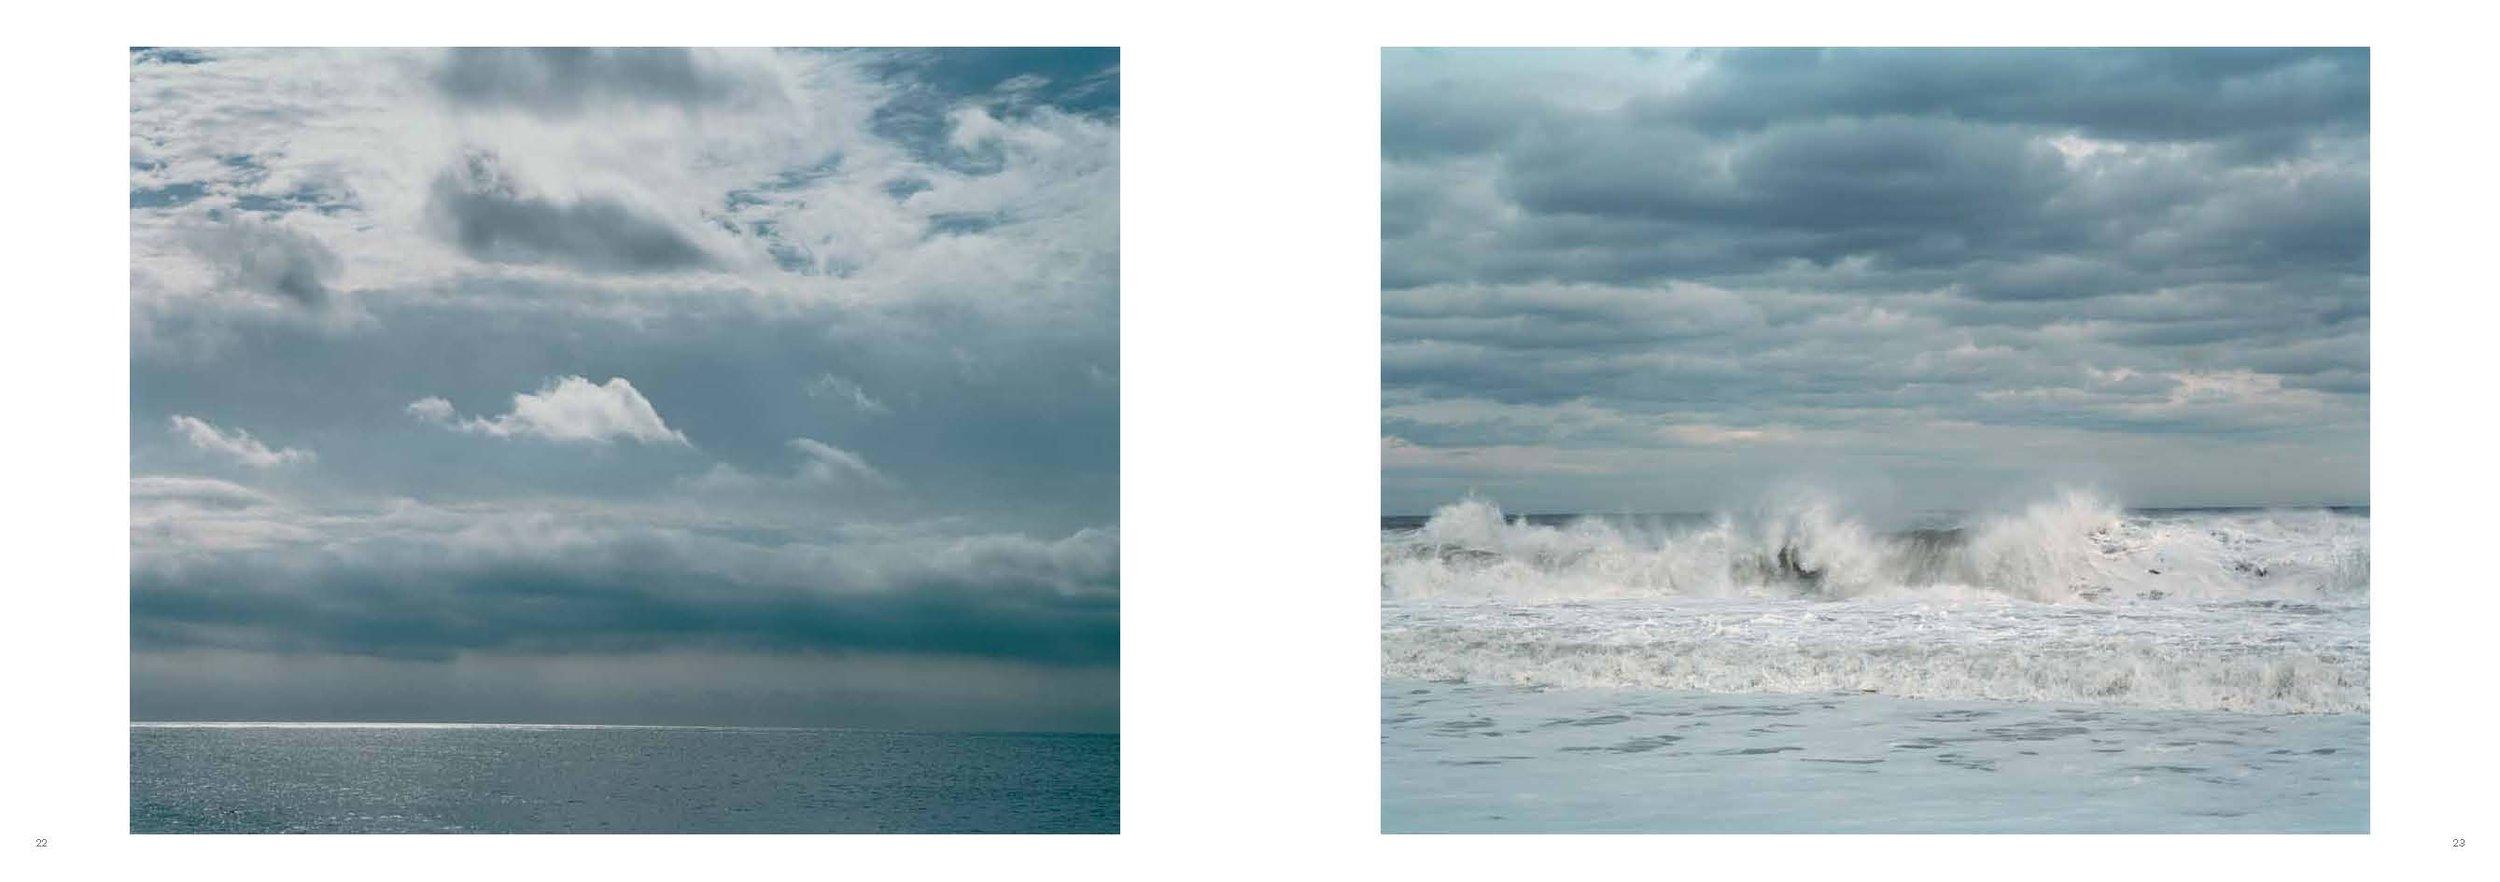 Sand_Sea_Sky_12.jpg